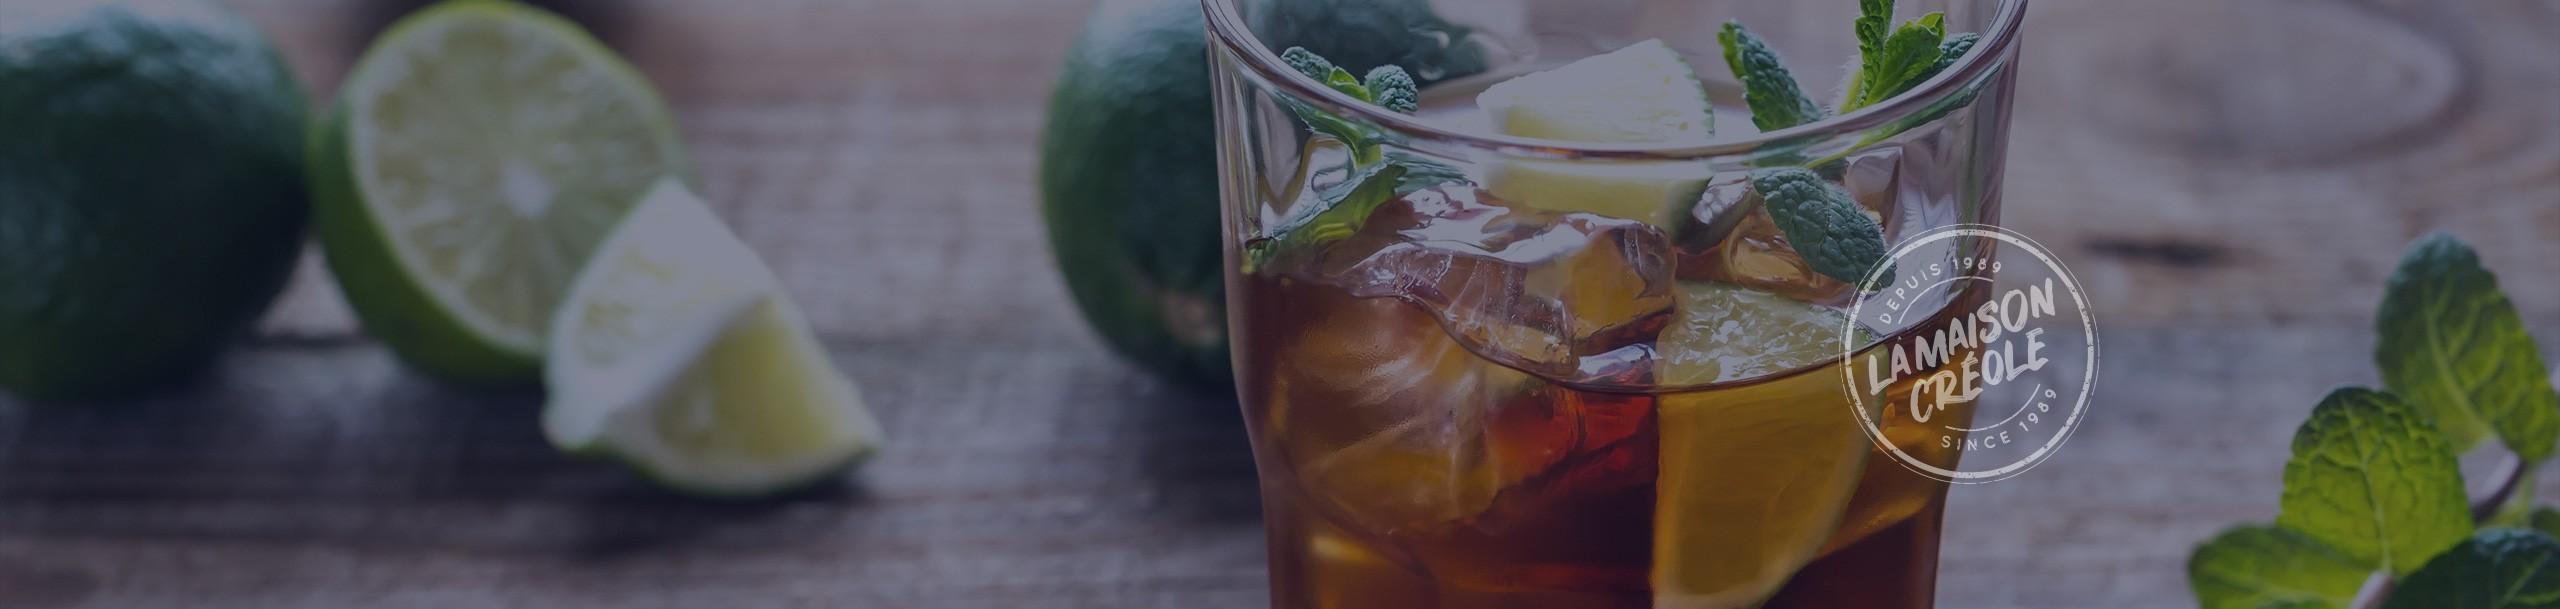 'Arrangés' (rum infusions) from Réunion Island